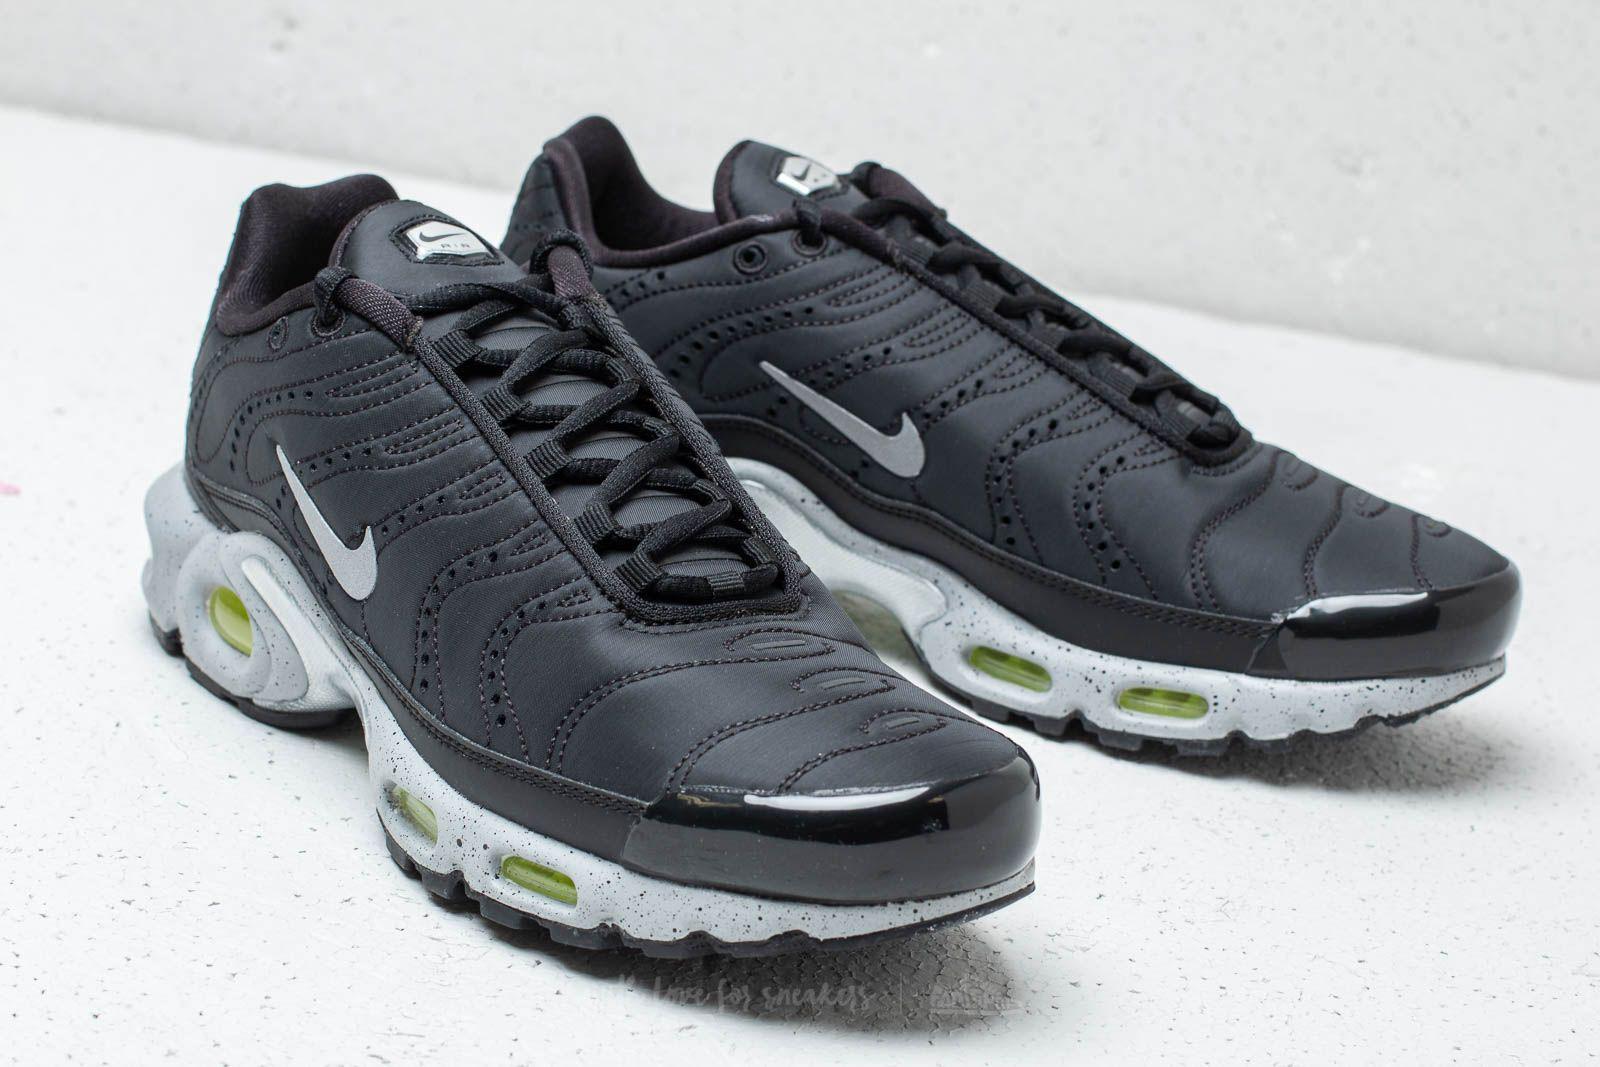 2517038dfa Nike Air Max Plus Premium Black/ Matte Silver-volt in Black for Men ...